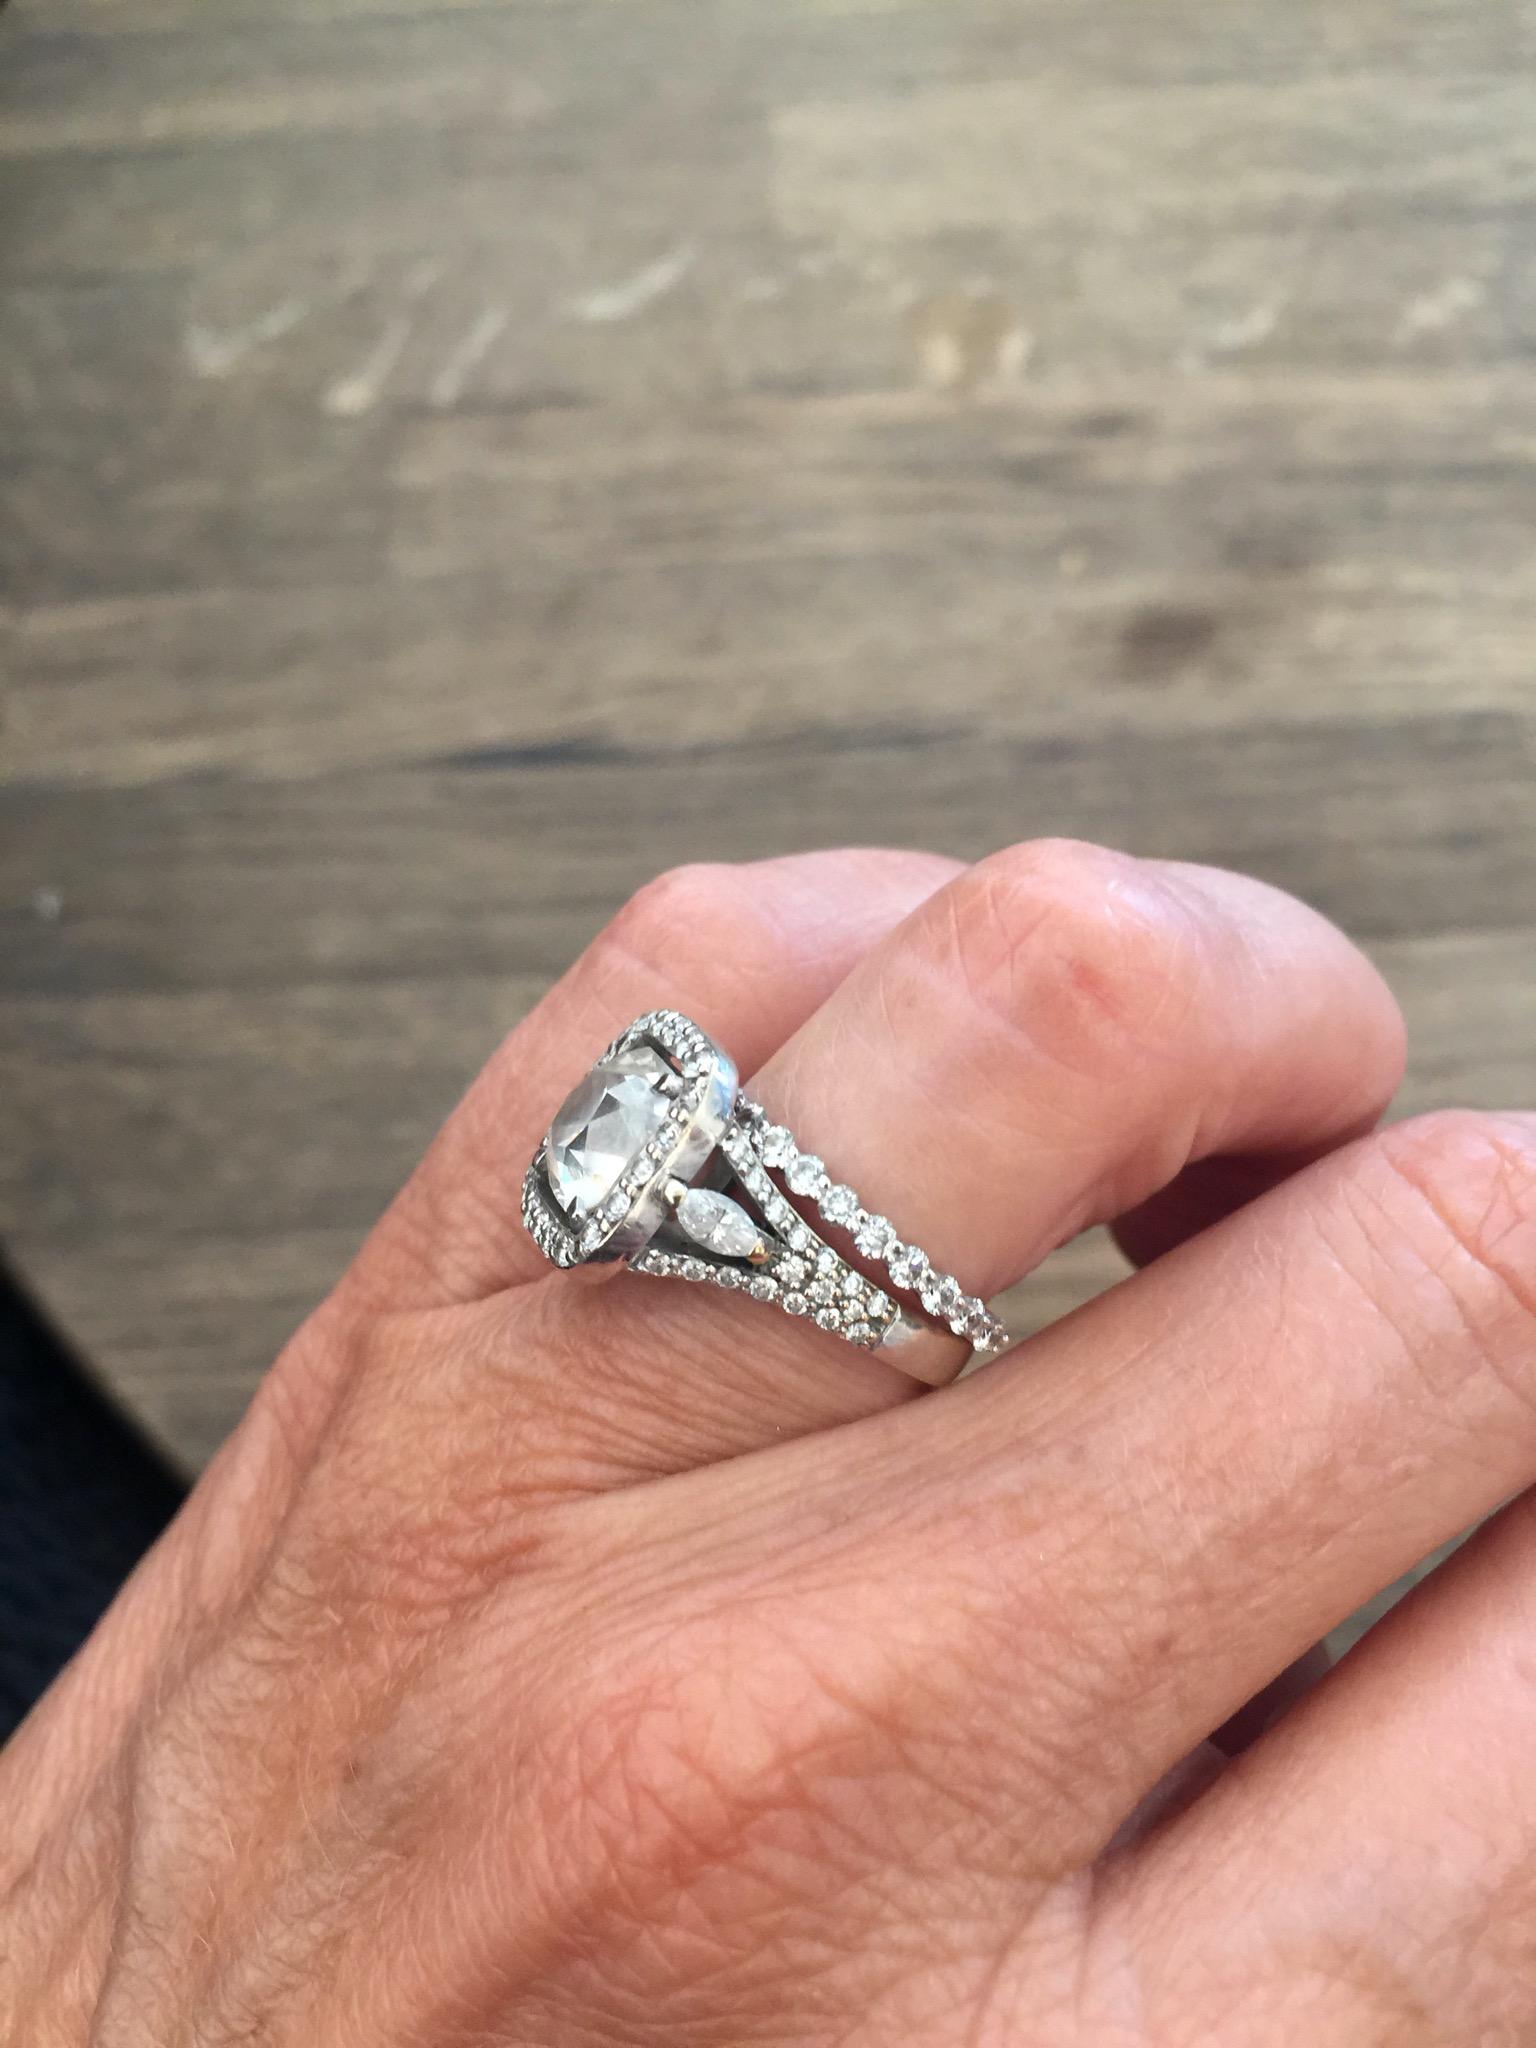 3.2 carat cushion cut diamond ring, with eternity ring